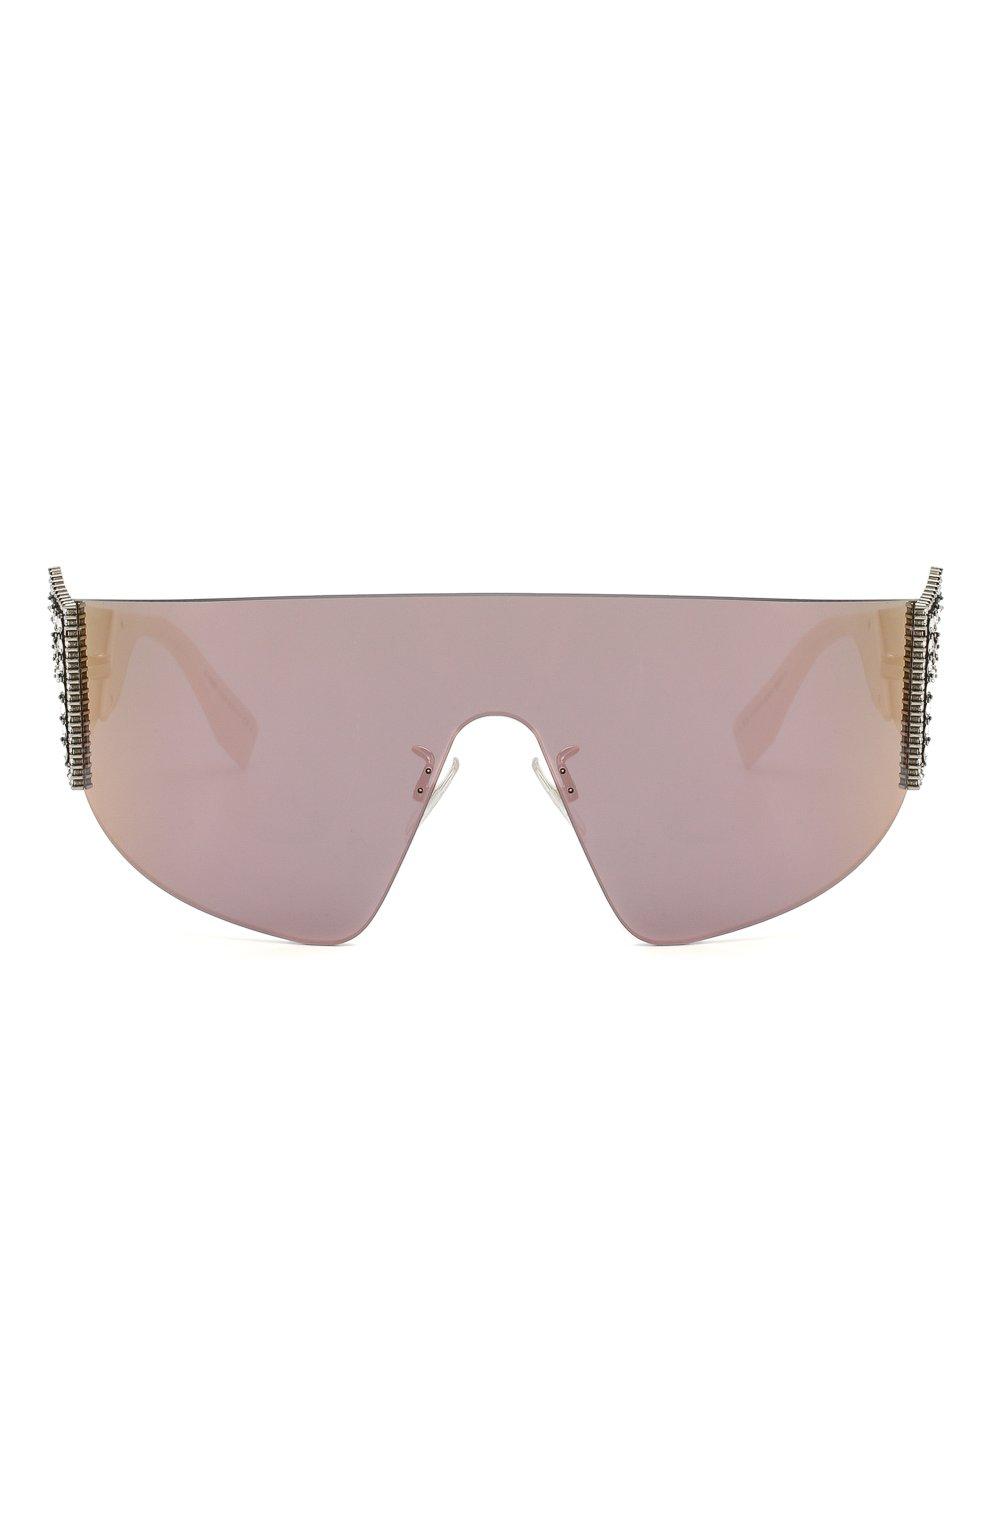 Женские солнцезащитные очки FENDI сиреневого цвета, арт. 0382 J5G | Фото 3